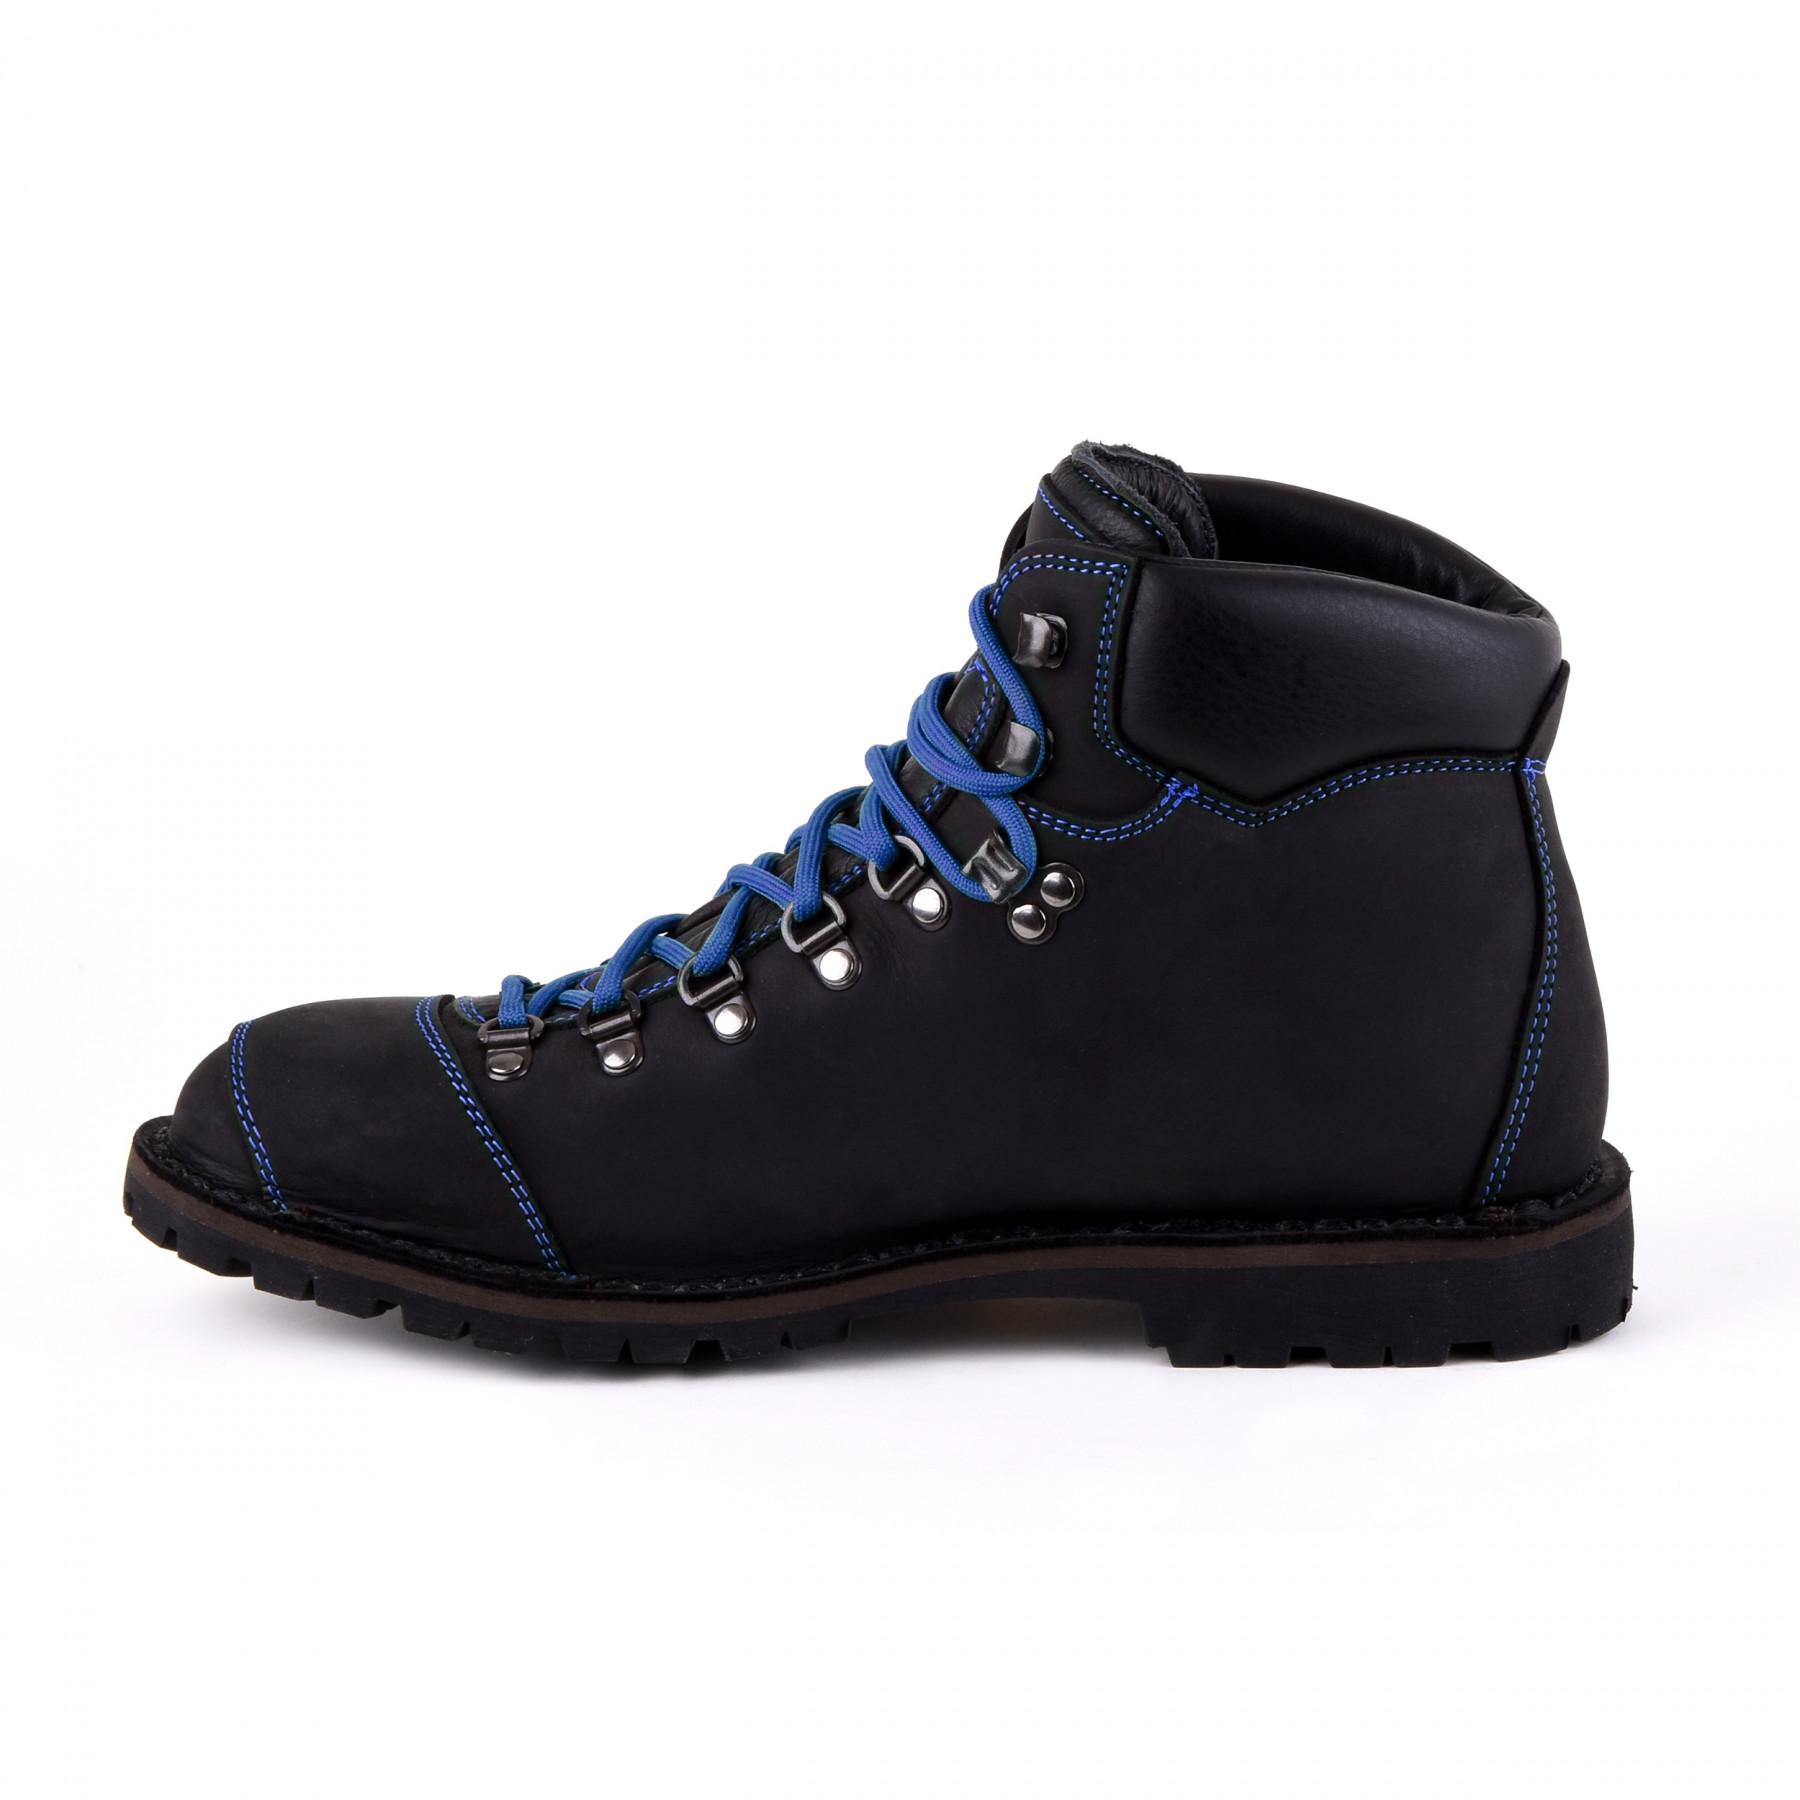 Biker Boot Adventure Denver Black, schwarze Damen Stiefel, blaue Nähte